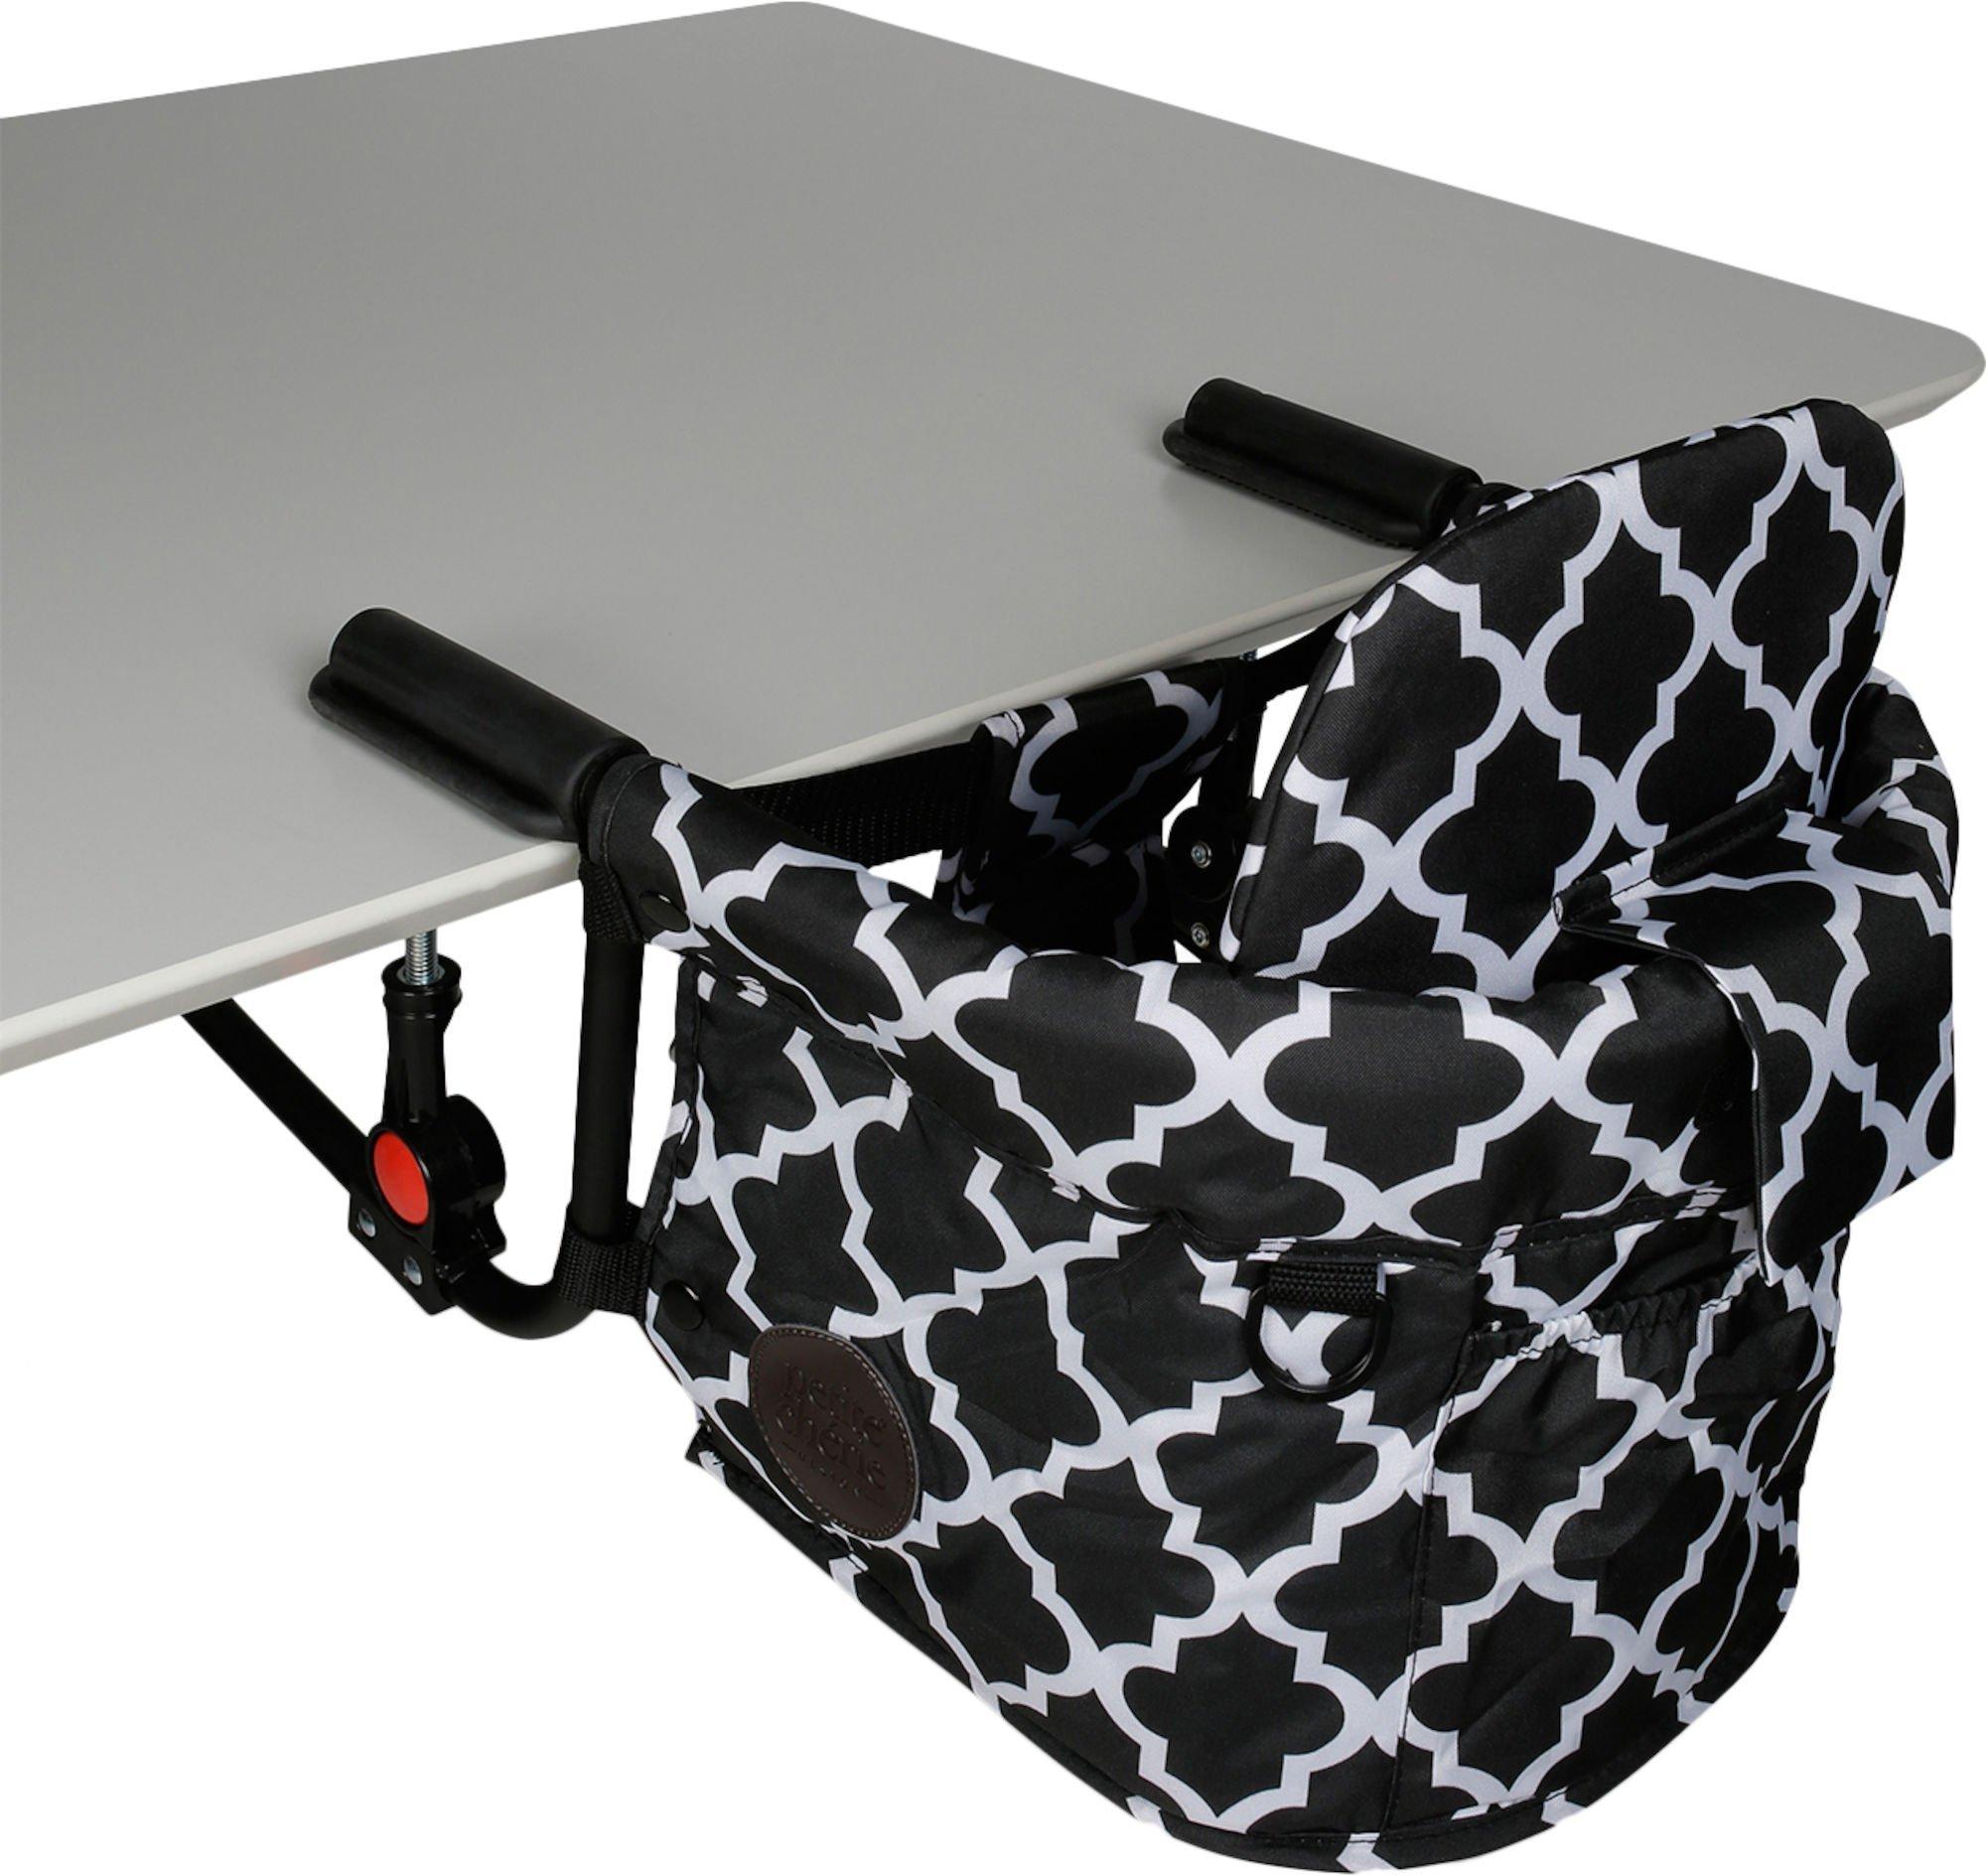 bumbo stol med bord